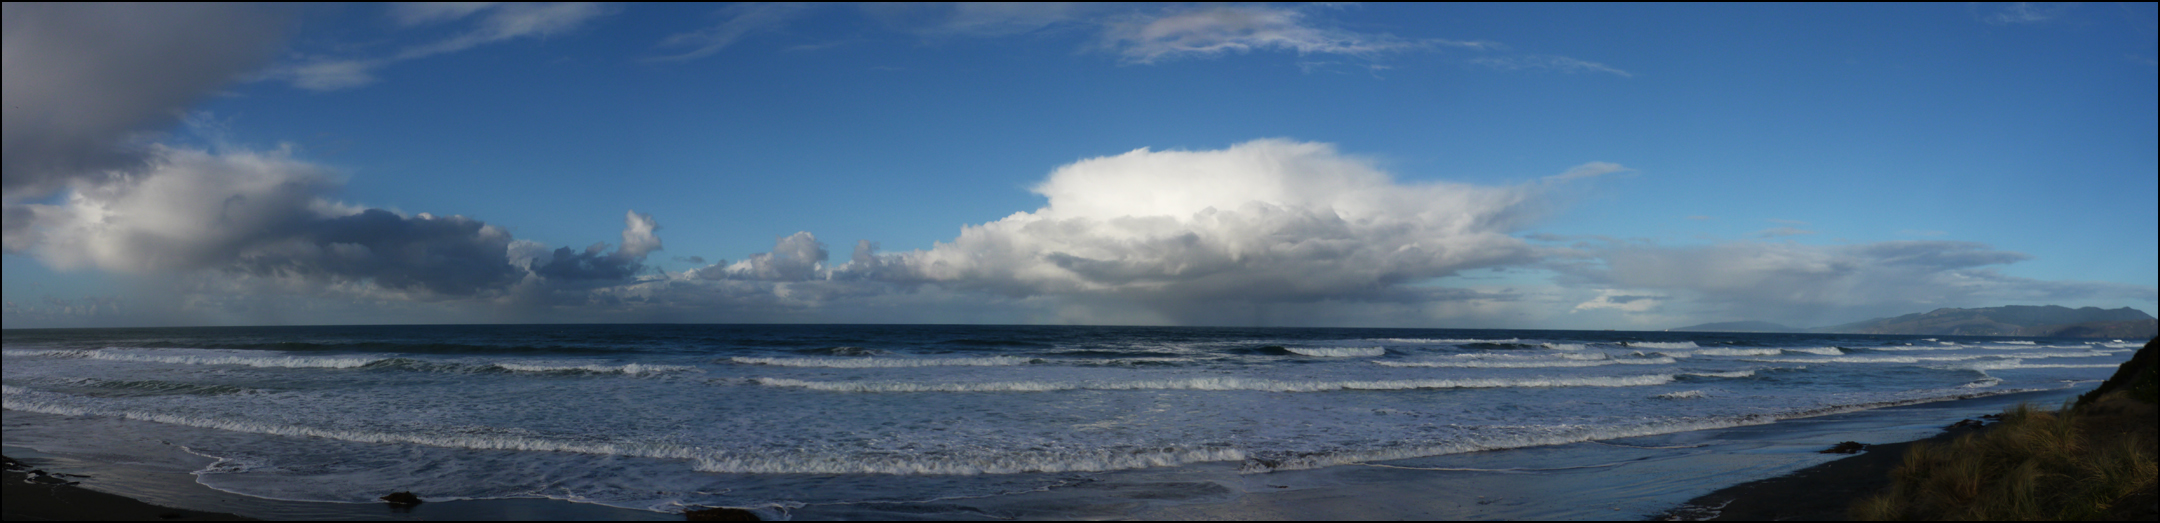 Ocean Beach this morning.jpg